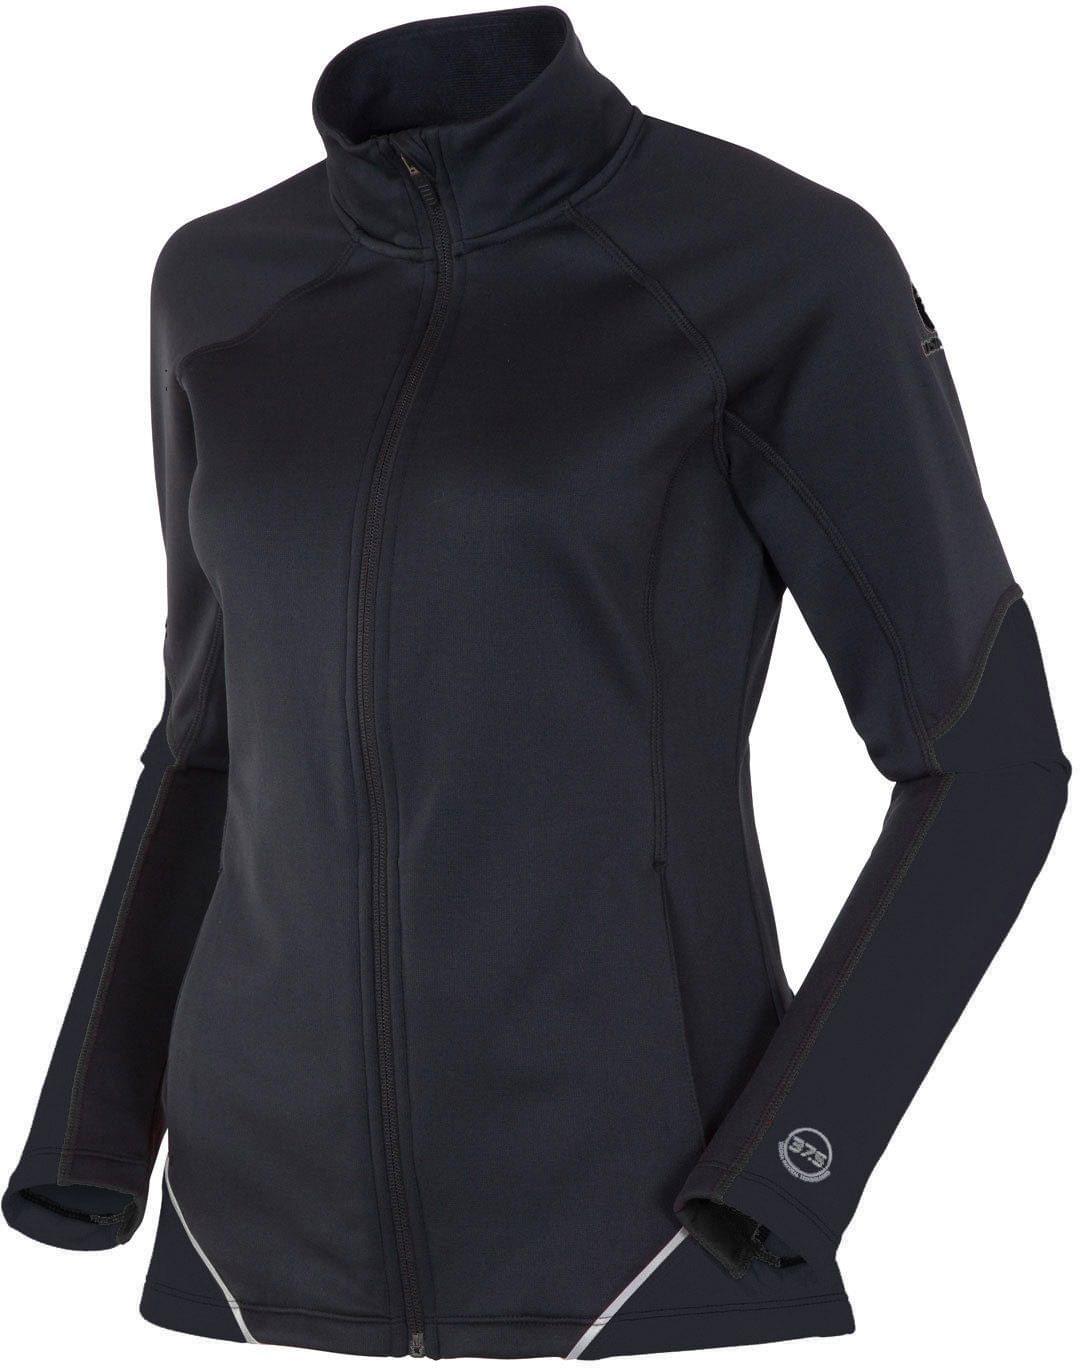 Dámská běžkařská bunda Rossignol Women FZ Ellips Jacket - black M